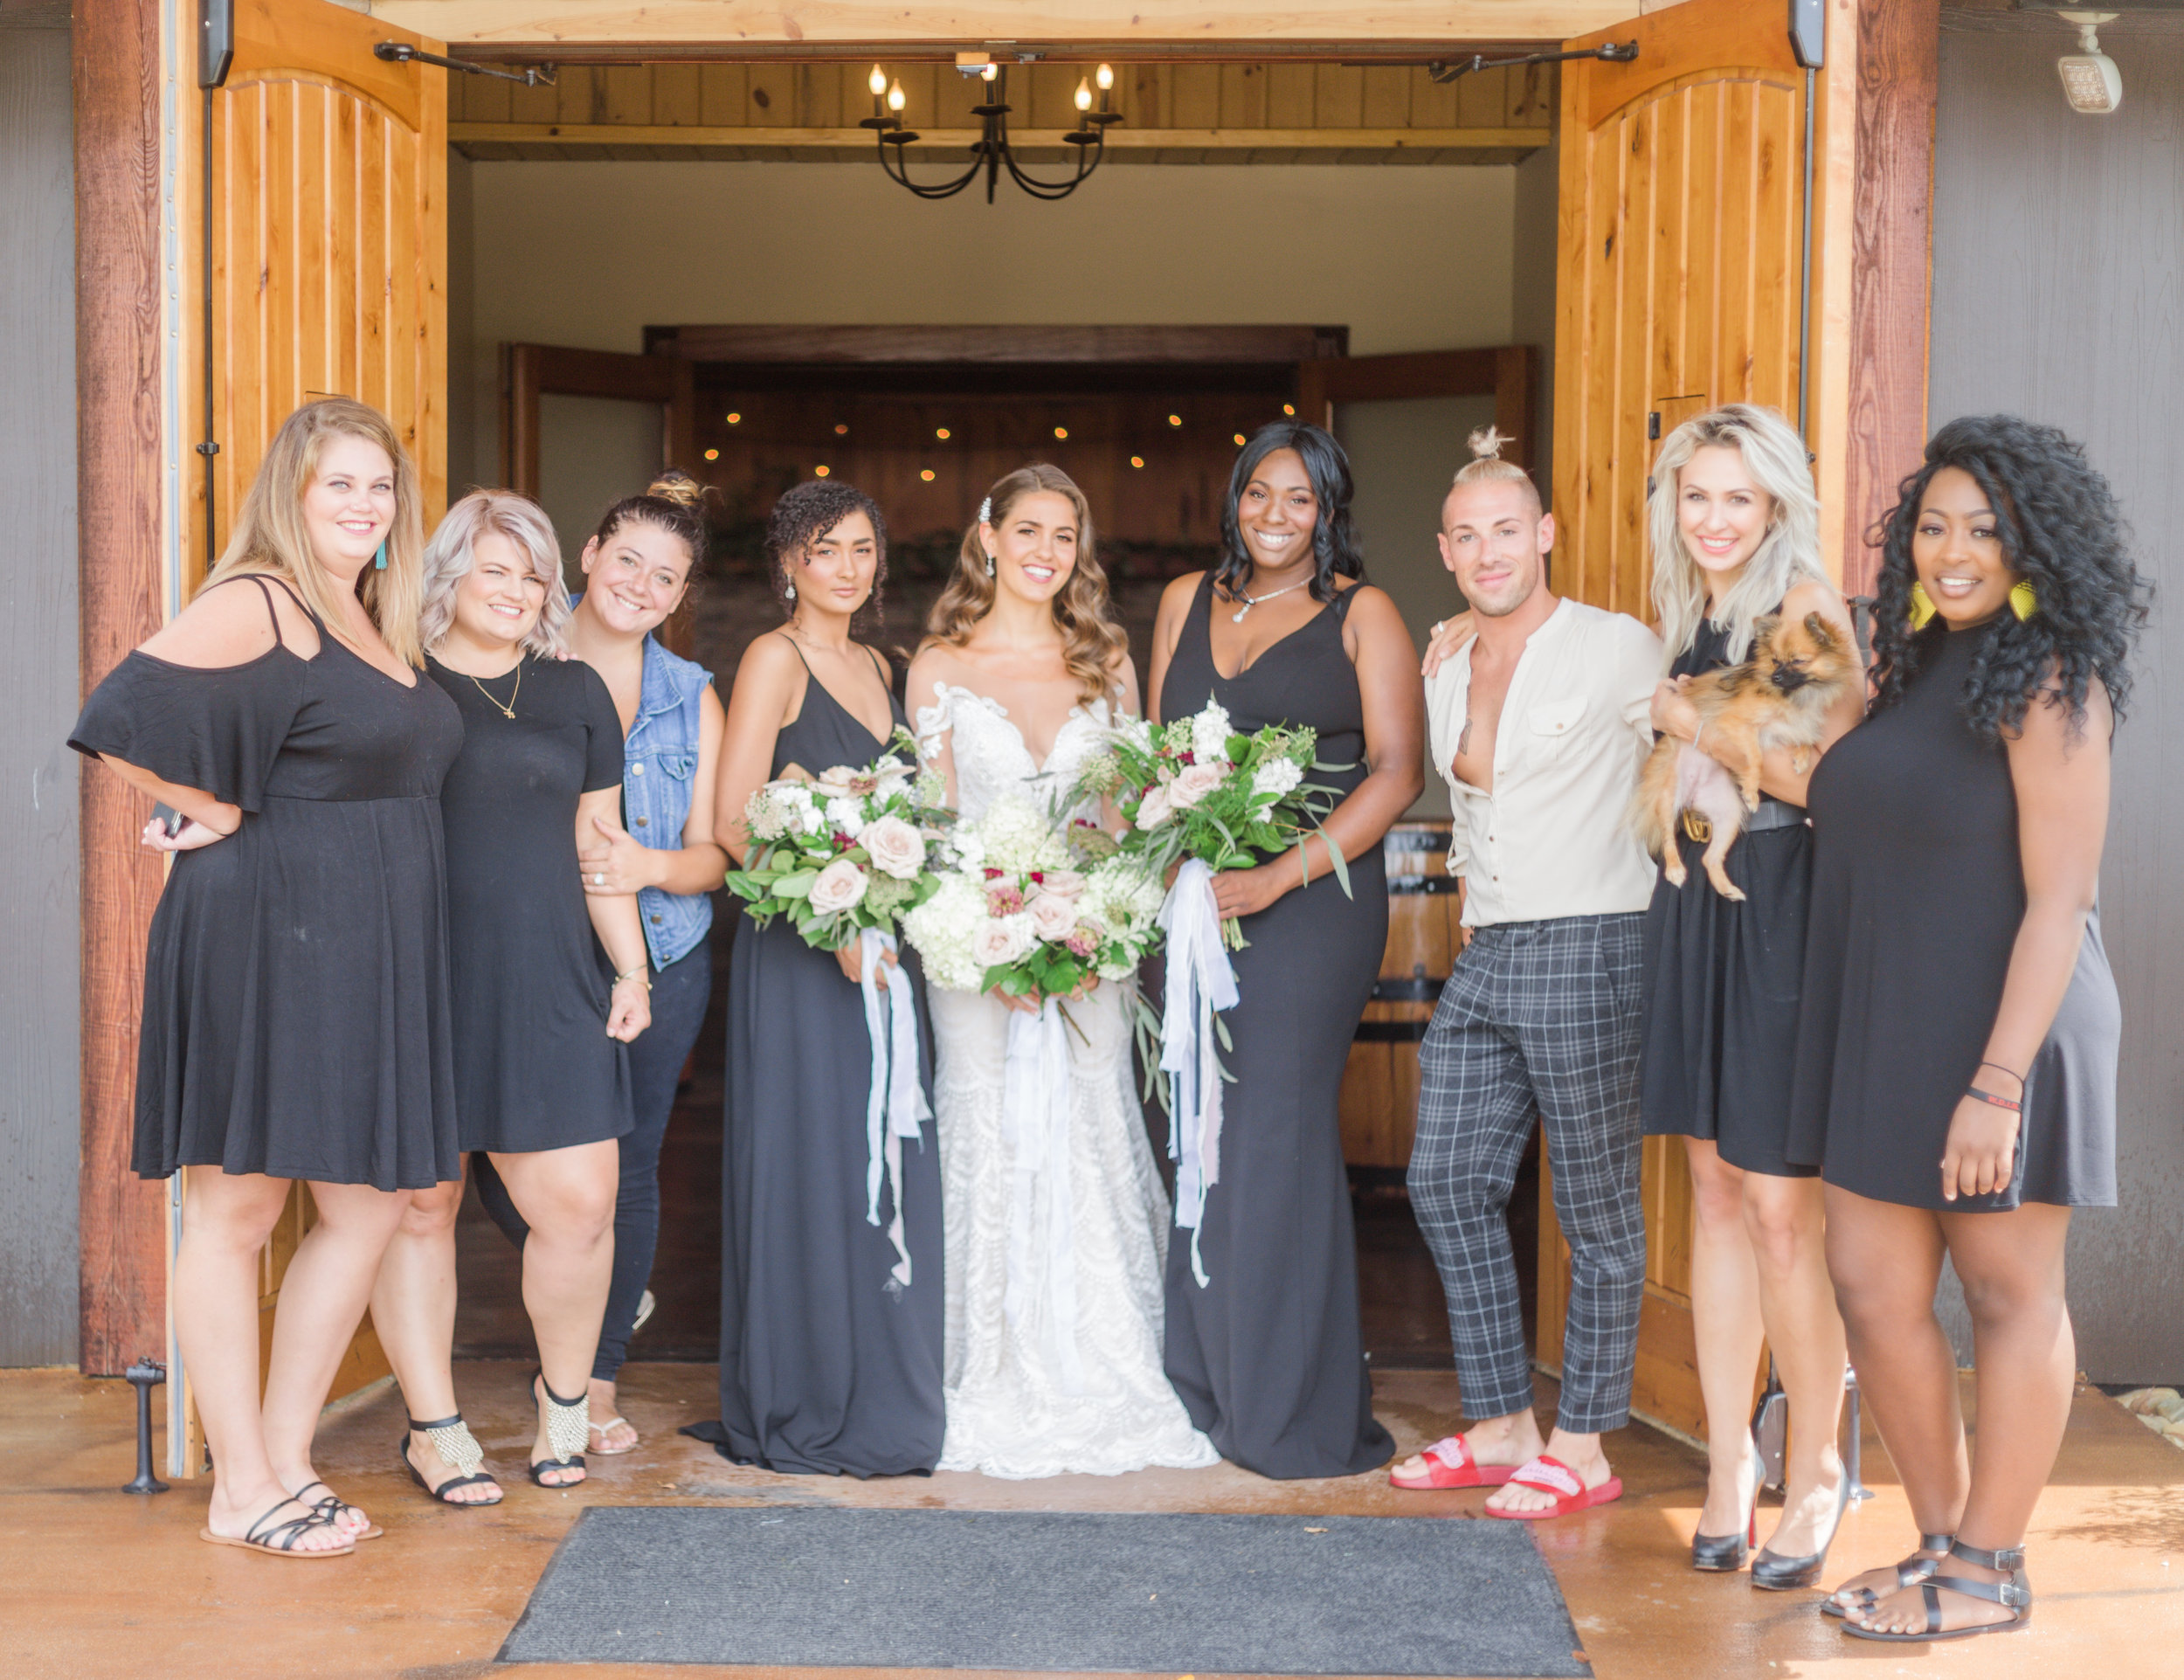 Ashton Creek Vineyards Wedding - Styled Shoot Vendors